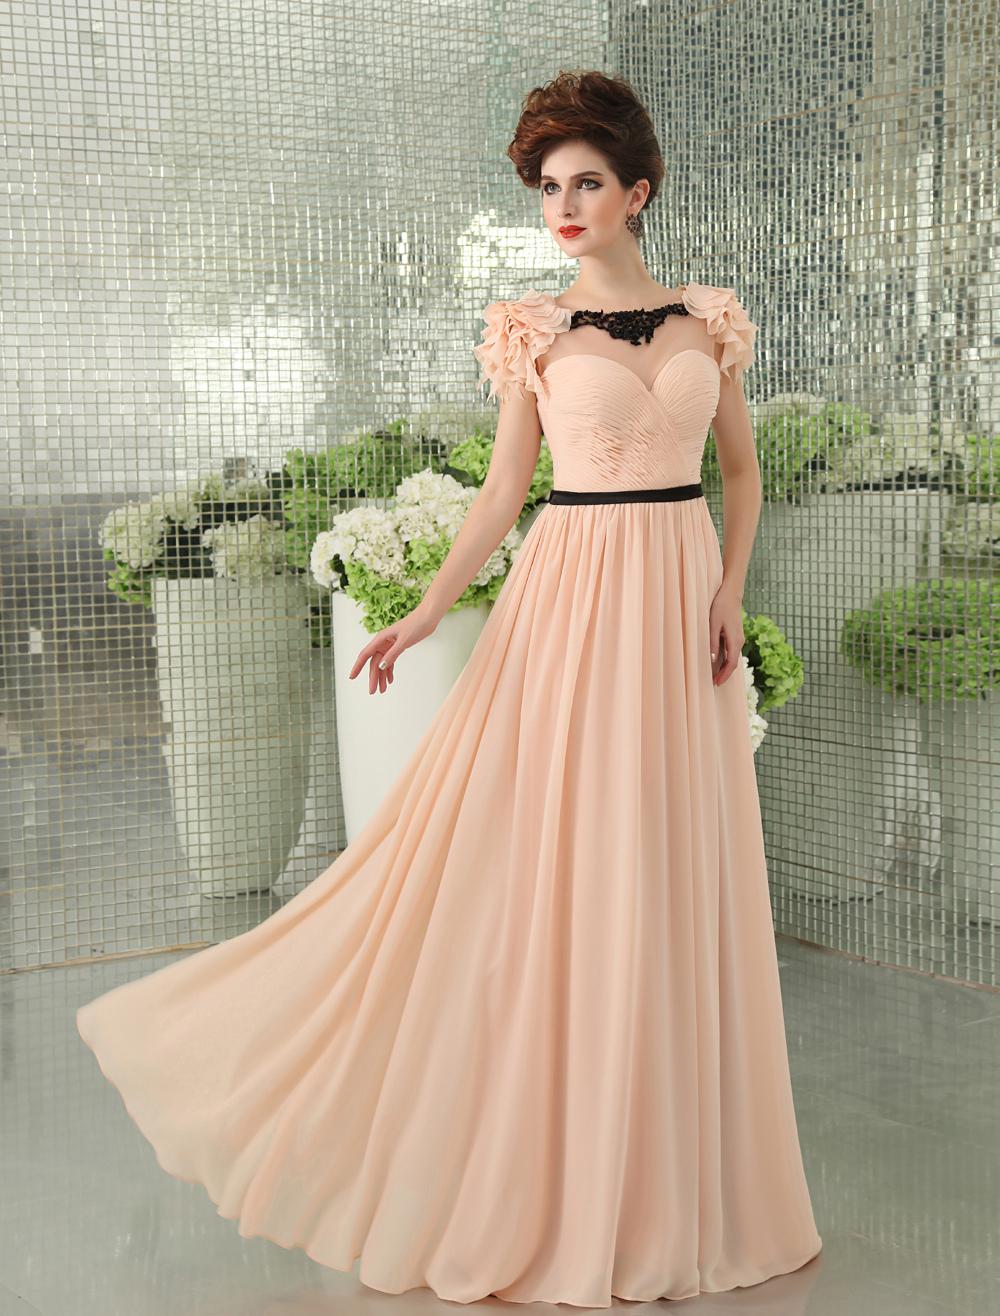 Light Pink Lace Sash Backless A-Line Chiffon Evening Dress (Wedding Evening Dresses) photo